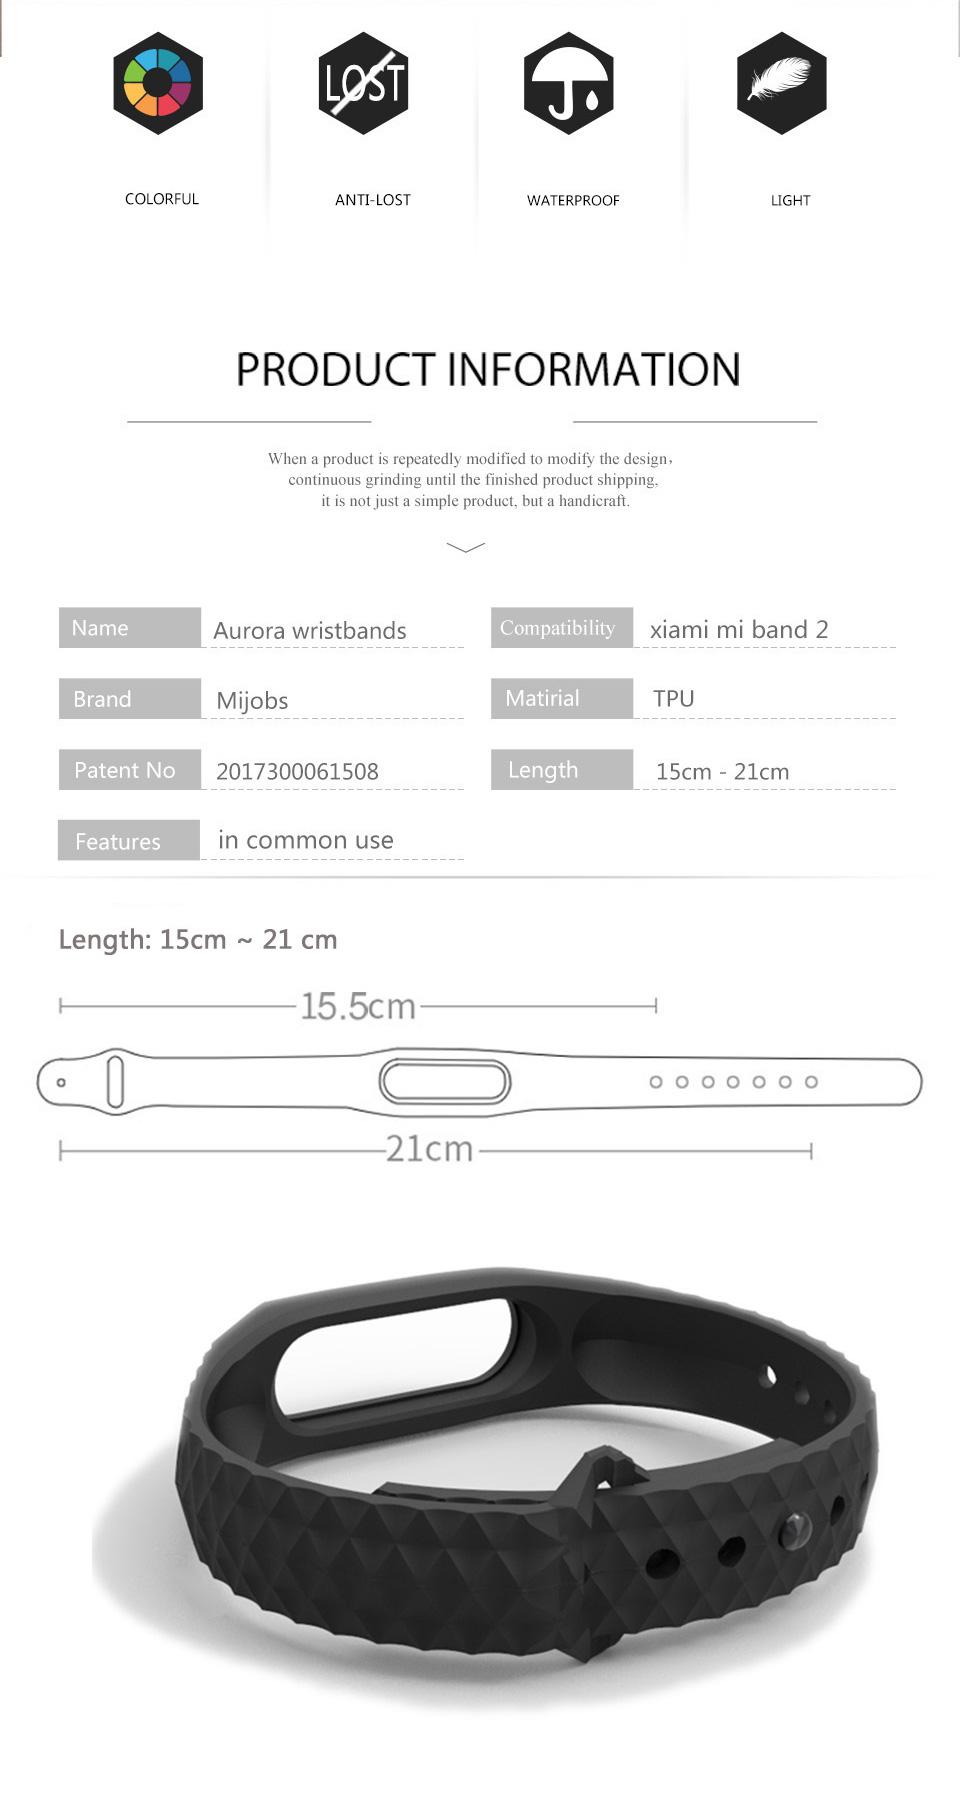 Mijobs Xiaomi Mi Band 2 Strap Silicone Strap Bracelet Replacement Wristband Smart Band Accessories Colorful wrist Strap 4